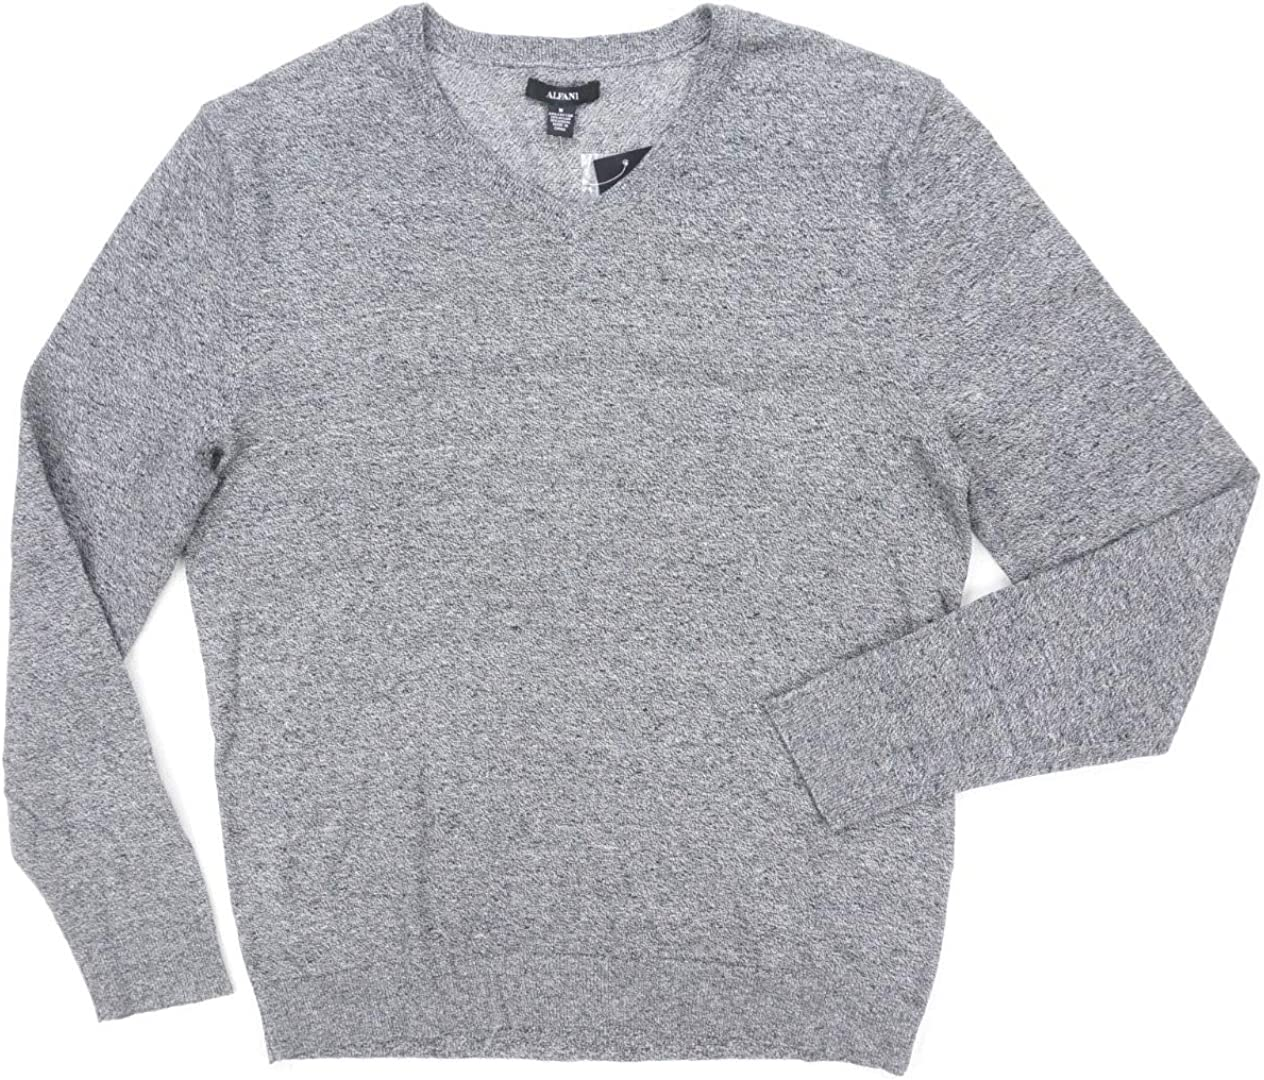 Alfani Mens V-Neck Long Sleeves Pullover Sweater B/W XL